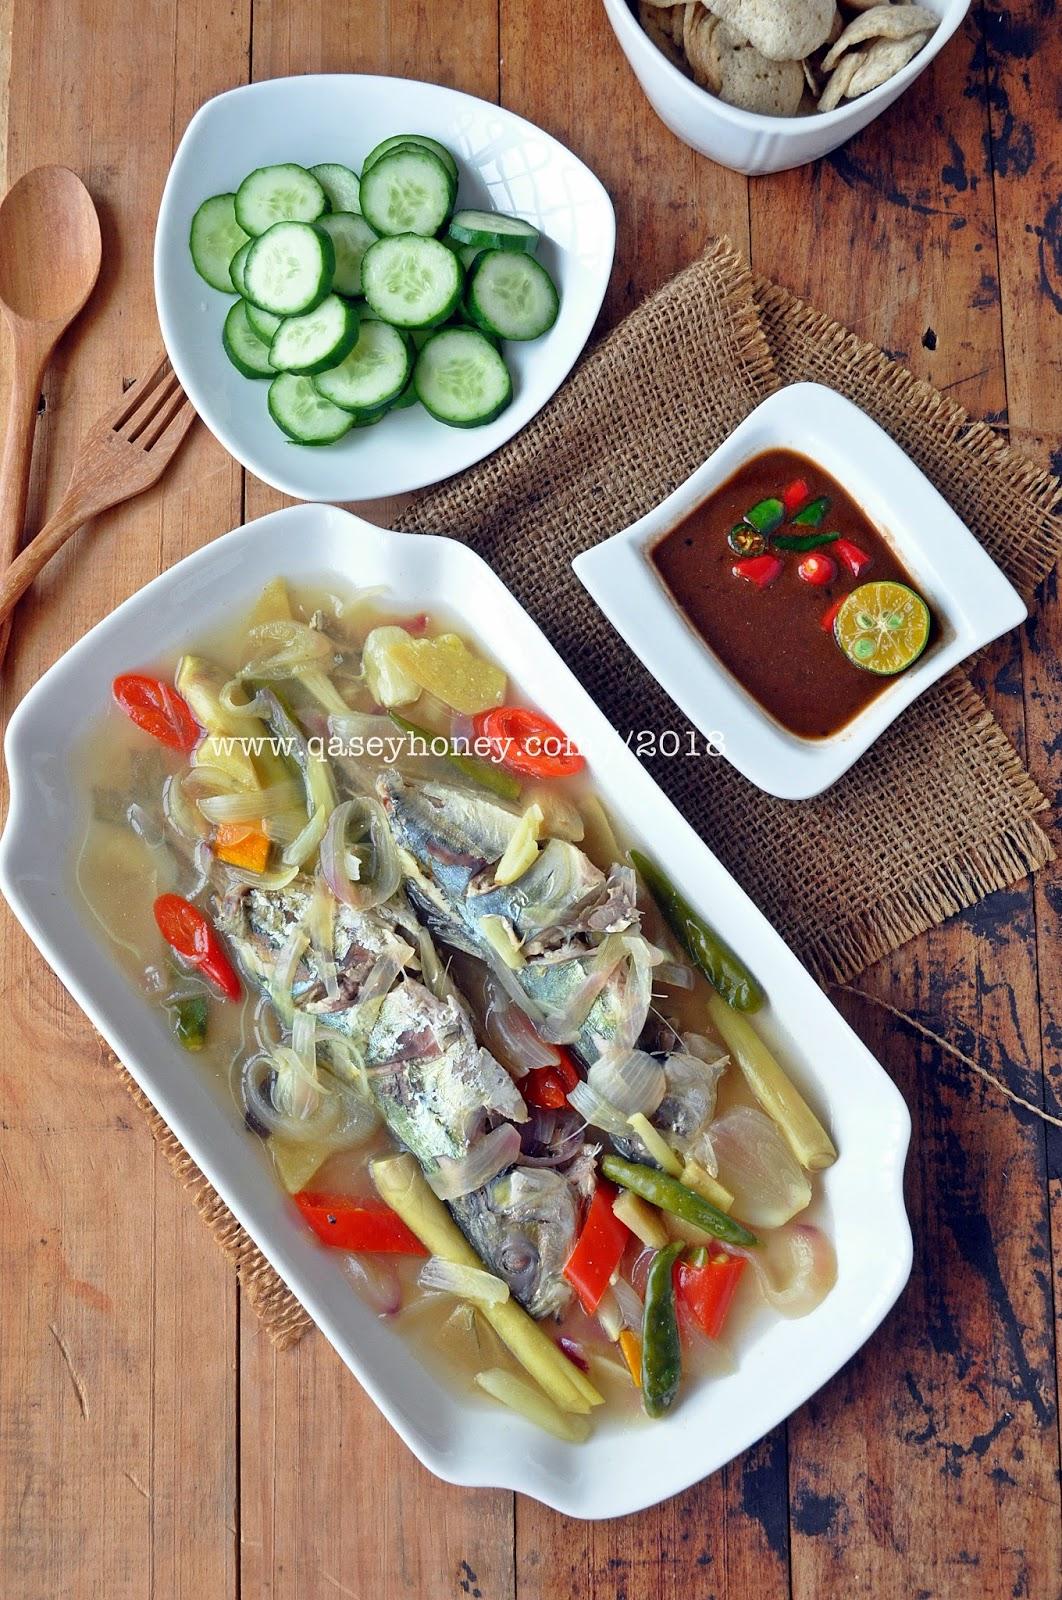 resepi ikan selar kuning masak sambal resep masakan khas Resepi Ikan Selar Kuning Masak Lemak Cili Api Enak dan Mudah